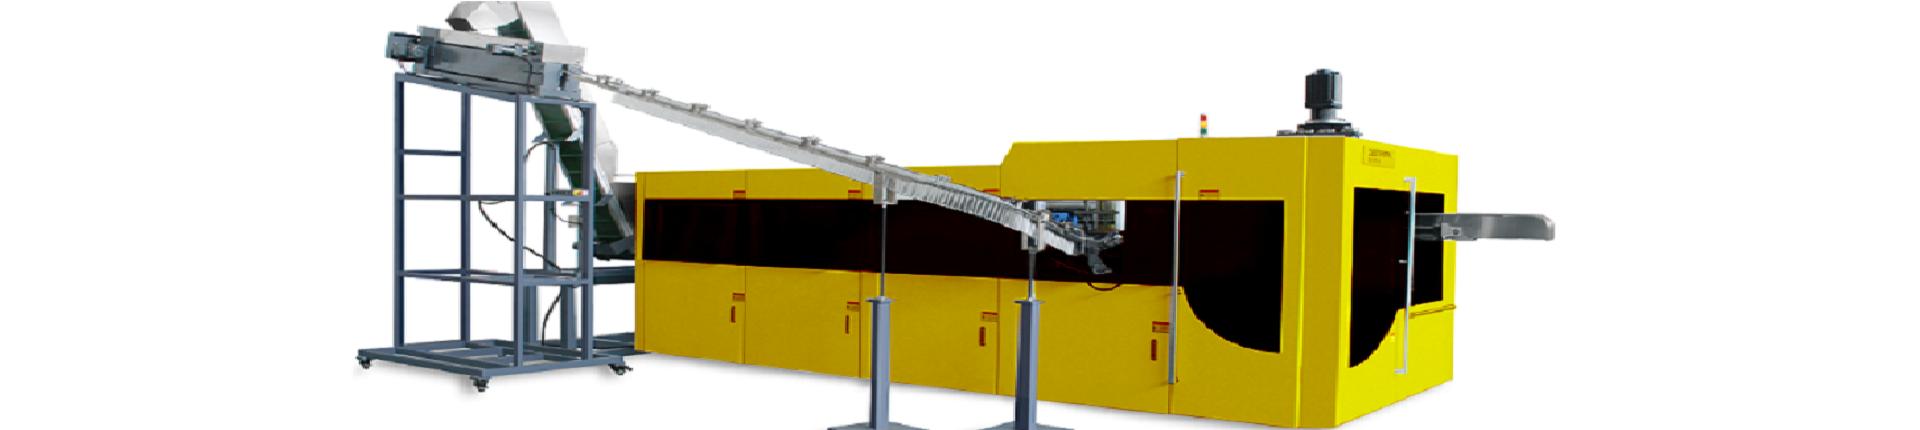 SFL-PP Series Blow Molding Machine Image